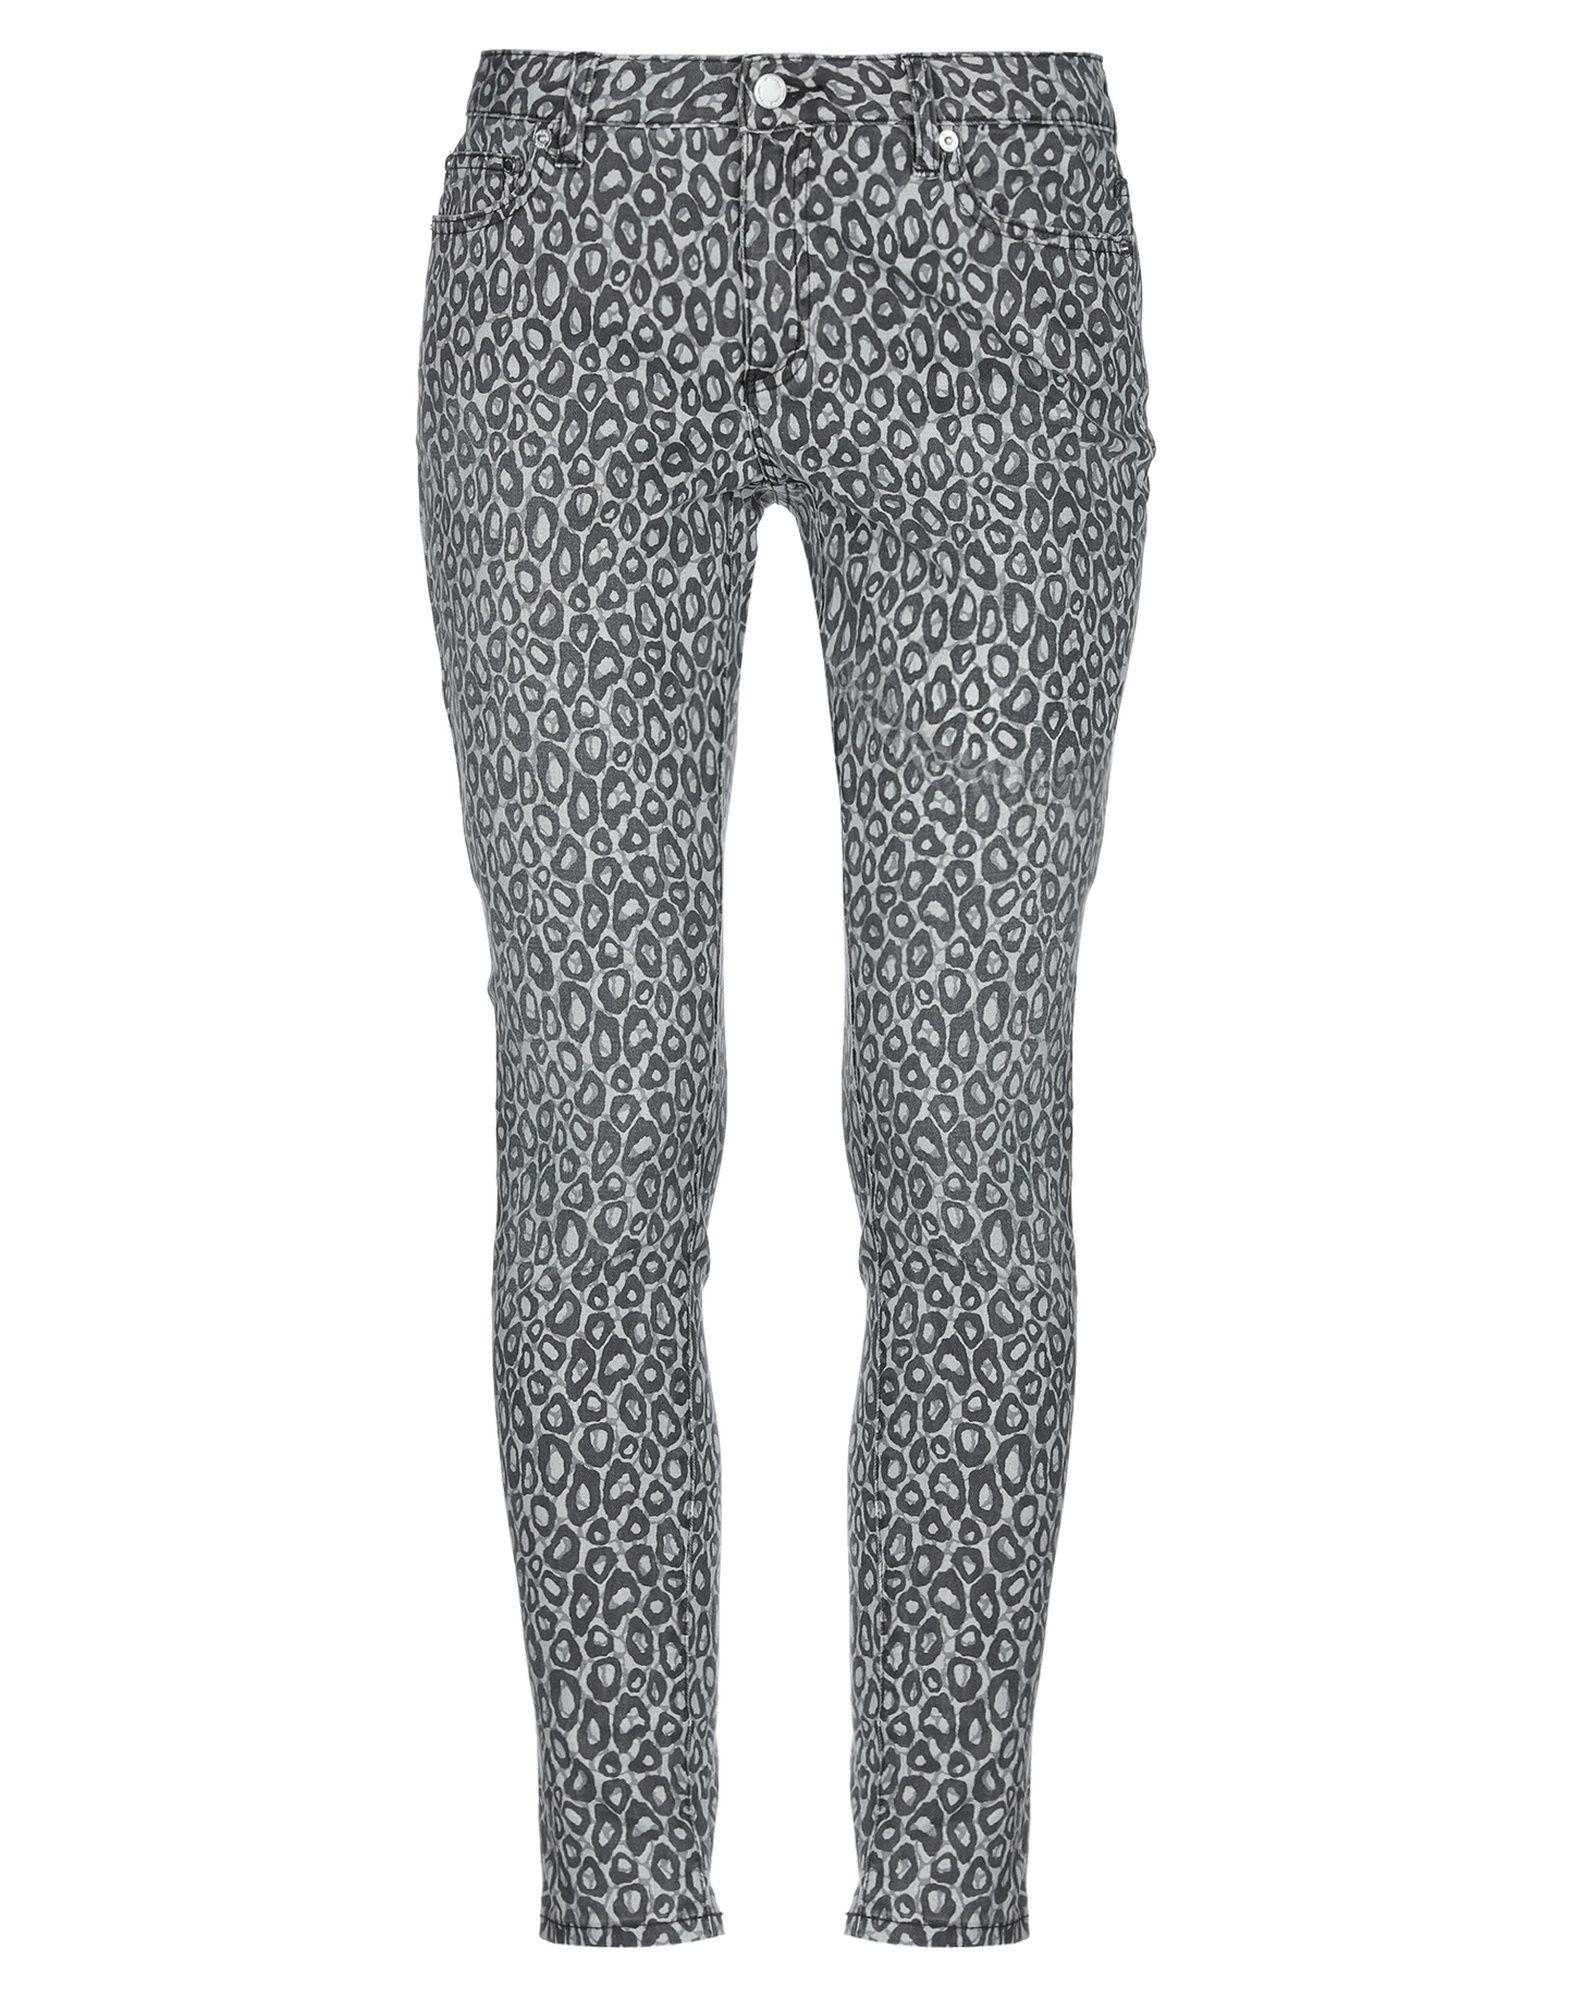 gabardine, no appliqués, multicolor pattern, mid rise, slim fit, tapered leg, button, zip, multipock